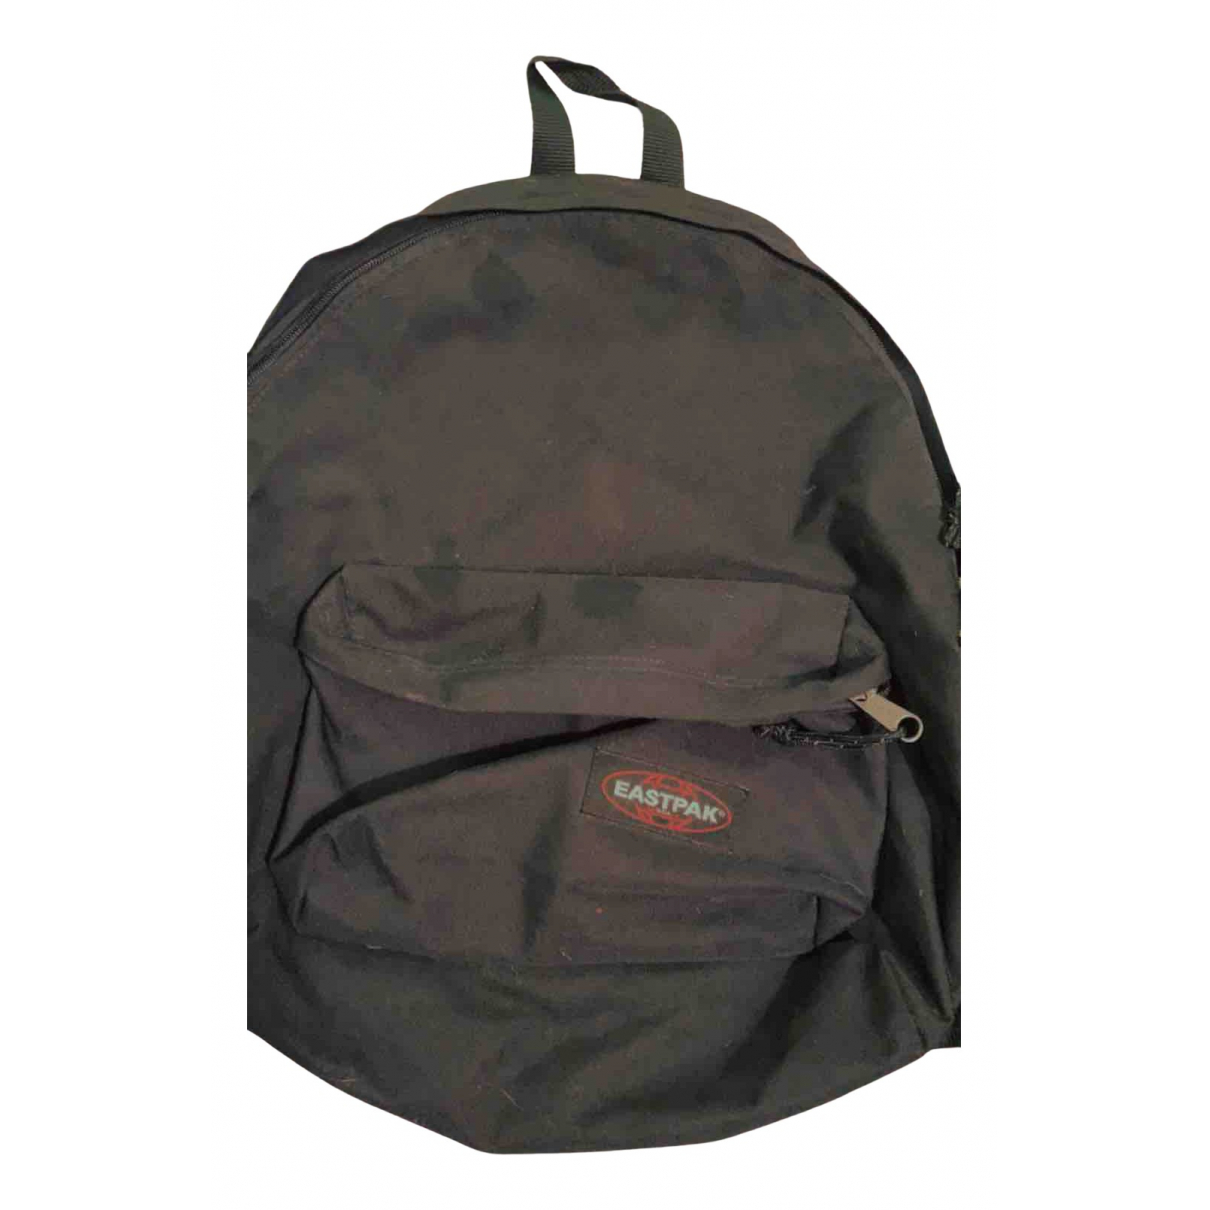 Eastpak N Black backpack for Women N